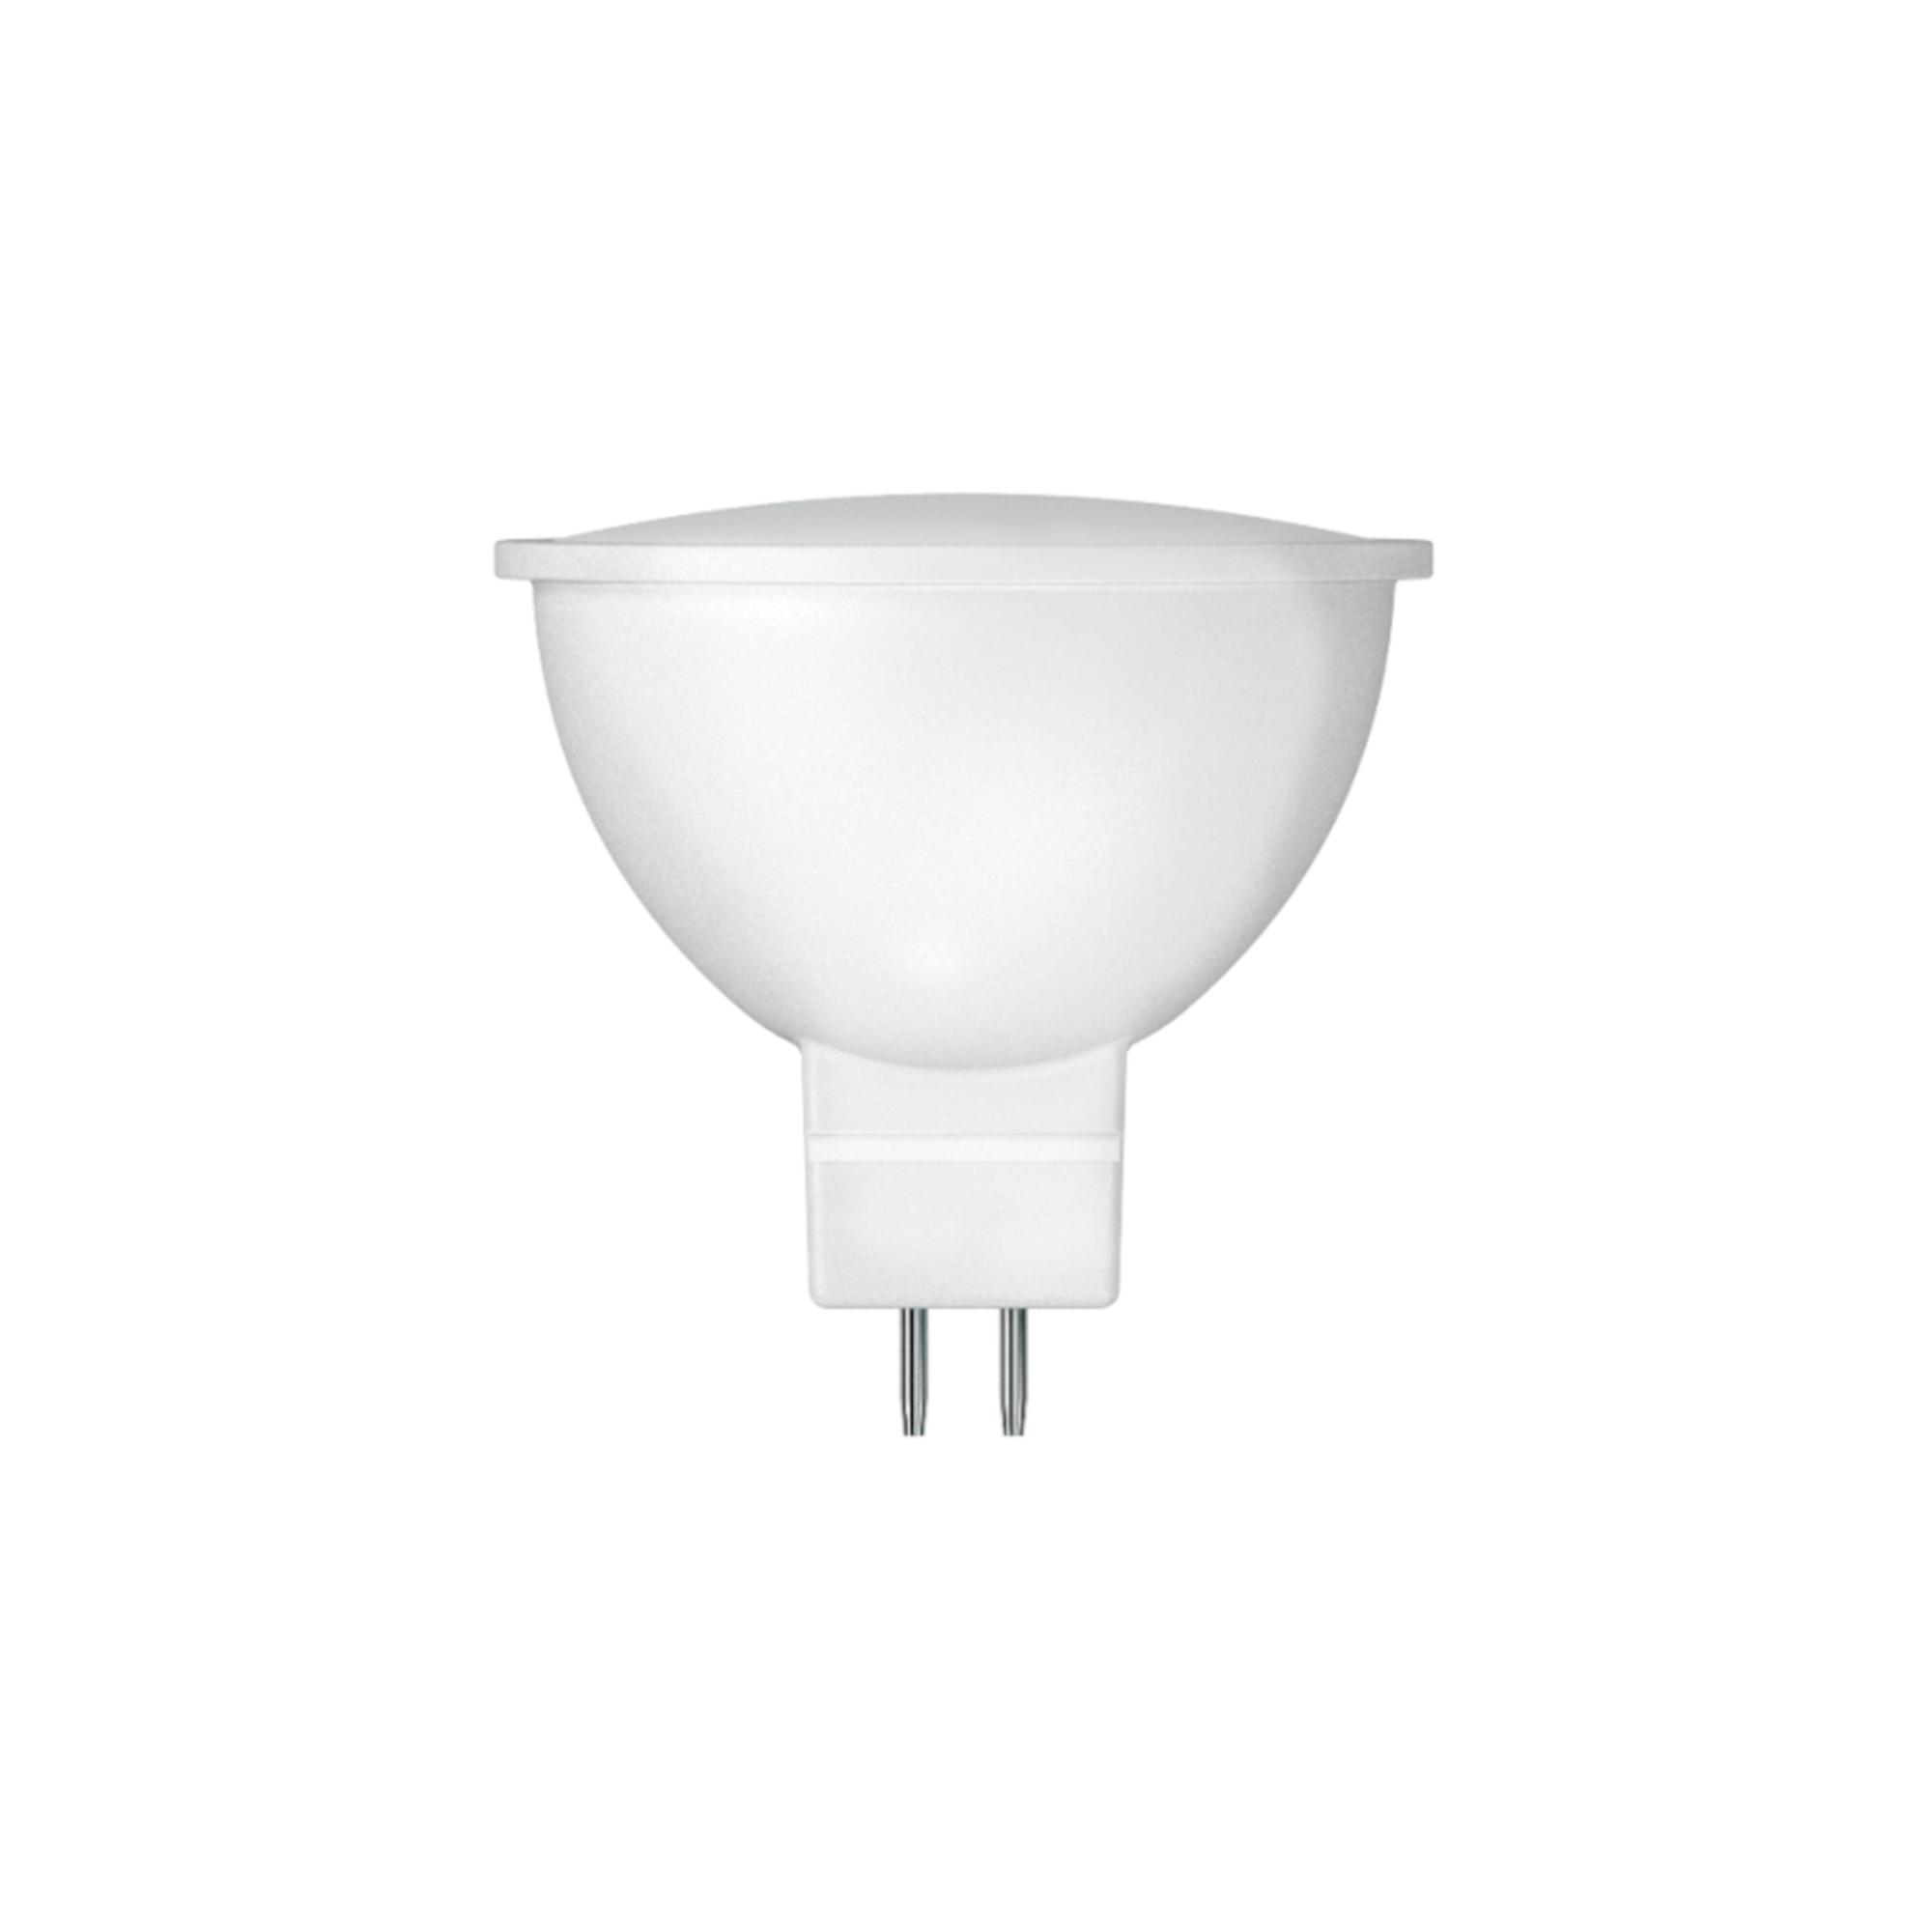 Лампа Светодиодная  Фотон LED MR16 5W GU5.3 6500K